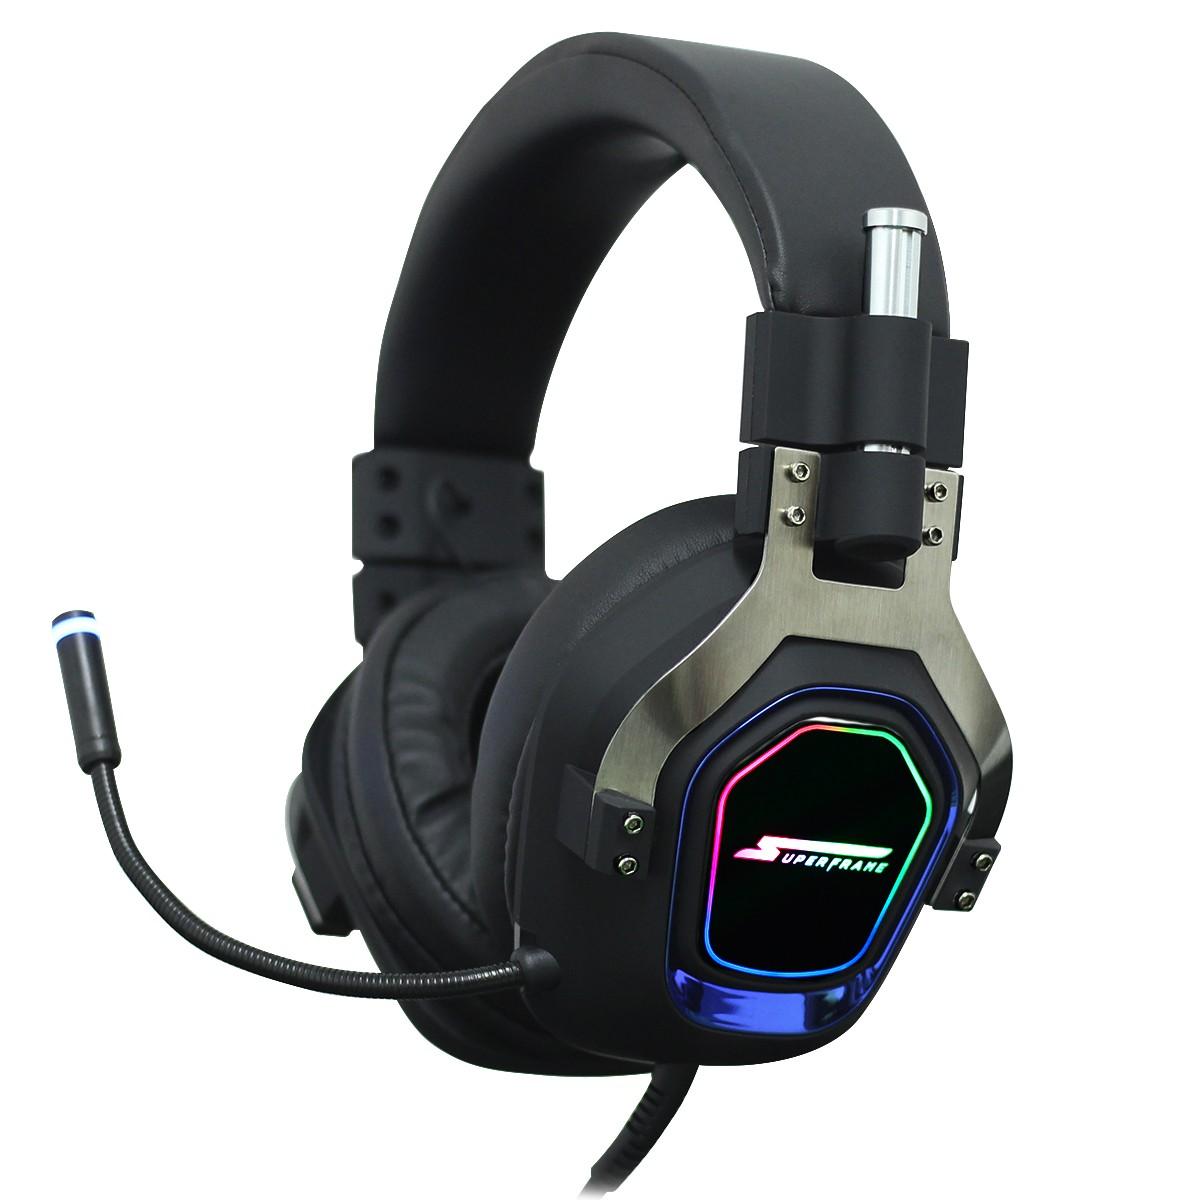 Headset Gamer SuperFrame PRAGMA, 7.1 Surround, RGB, USB, Drives de 50mm, Black